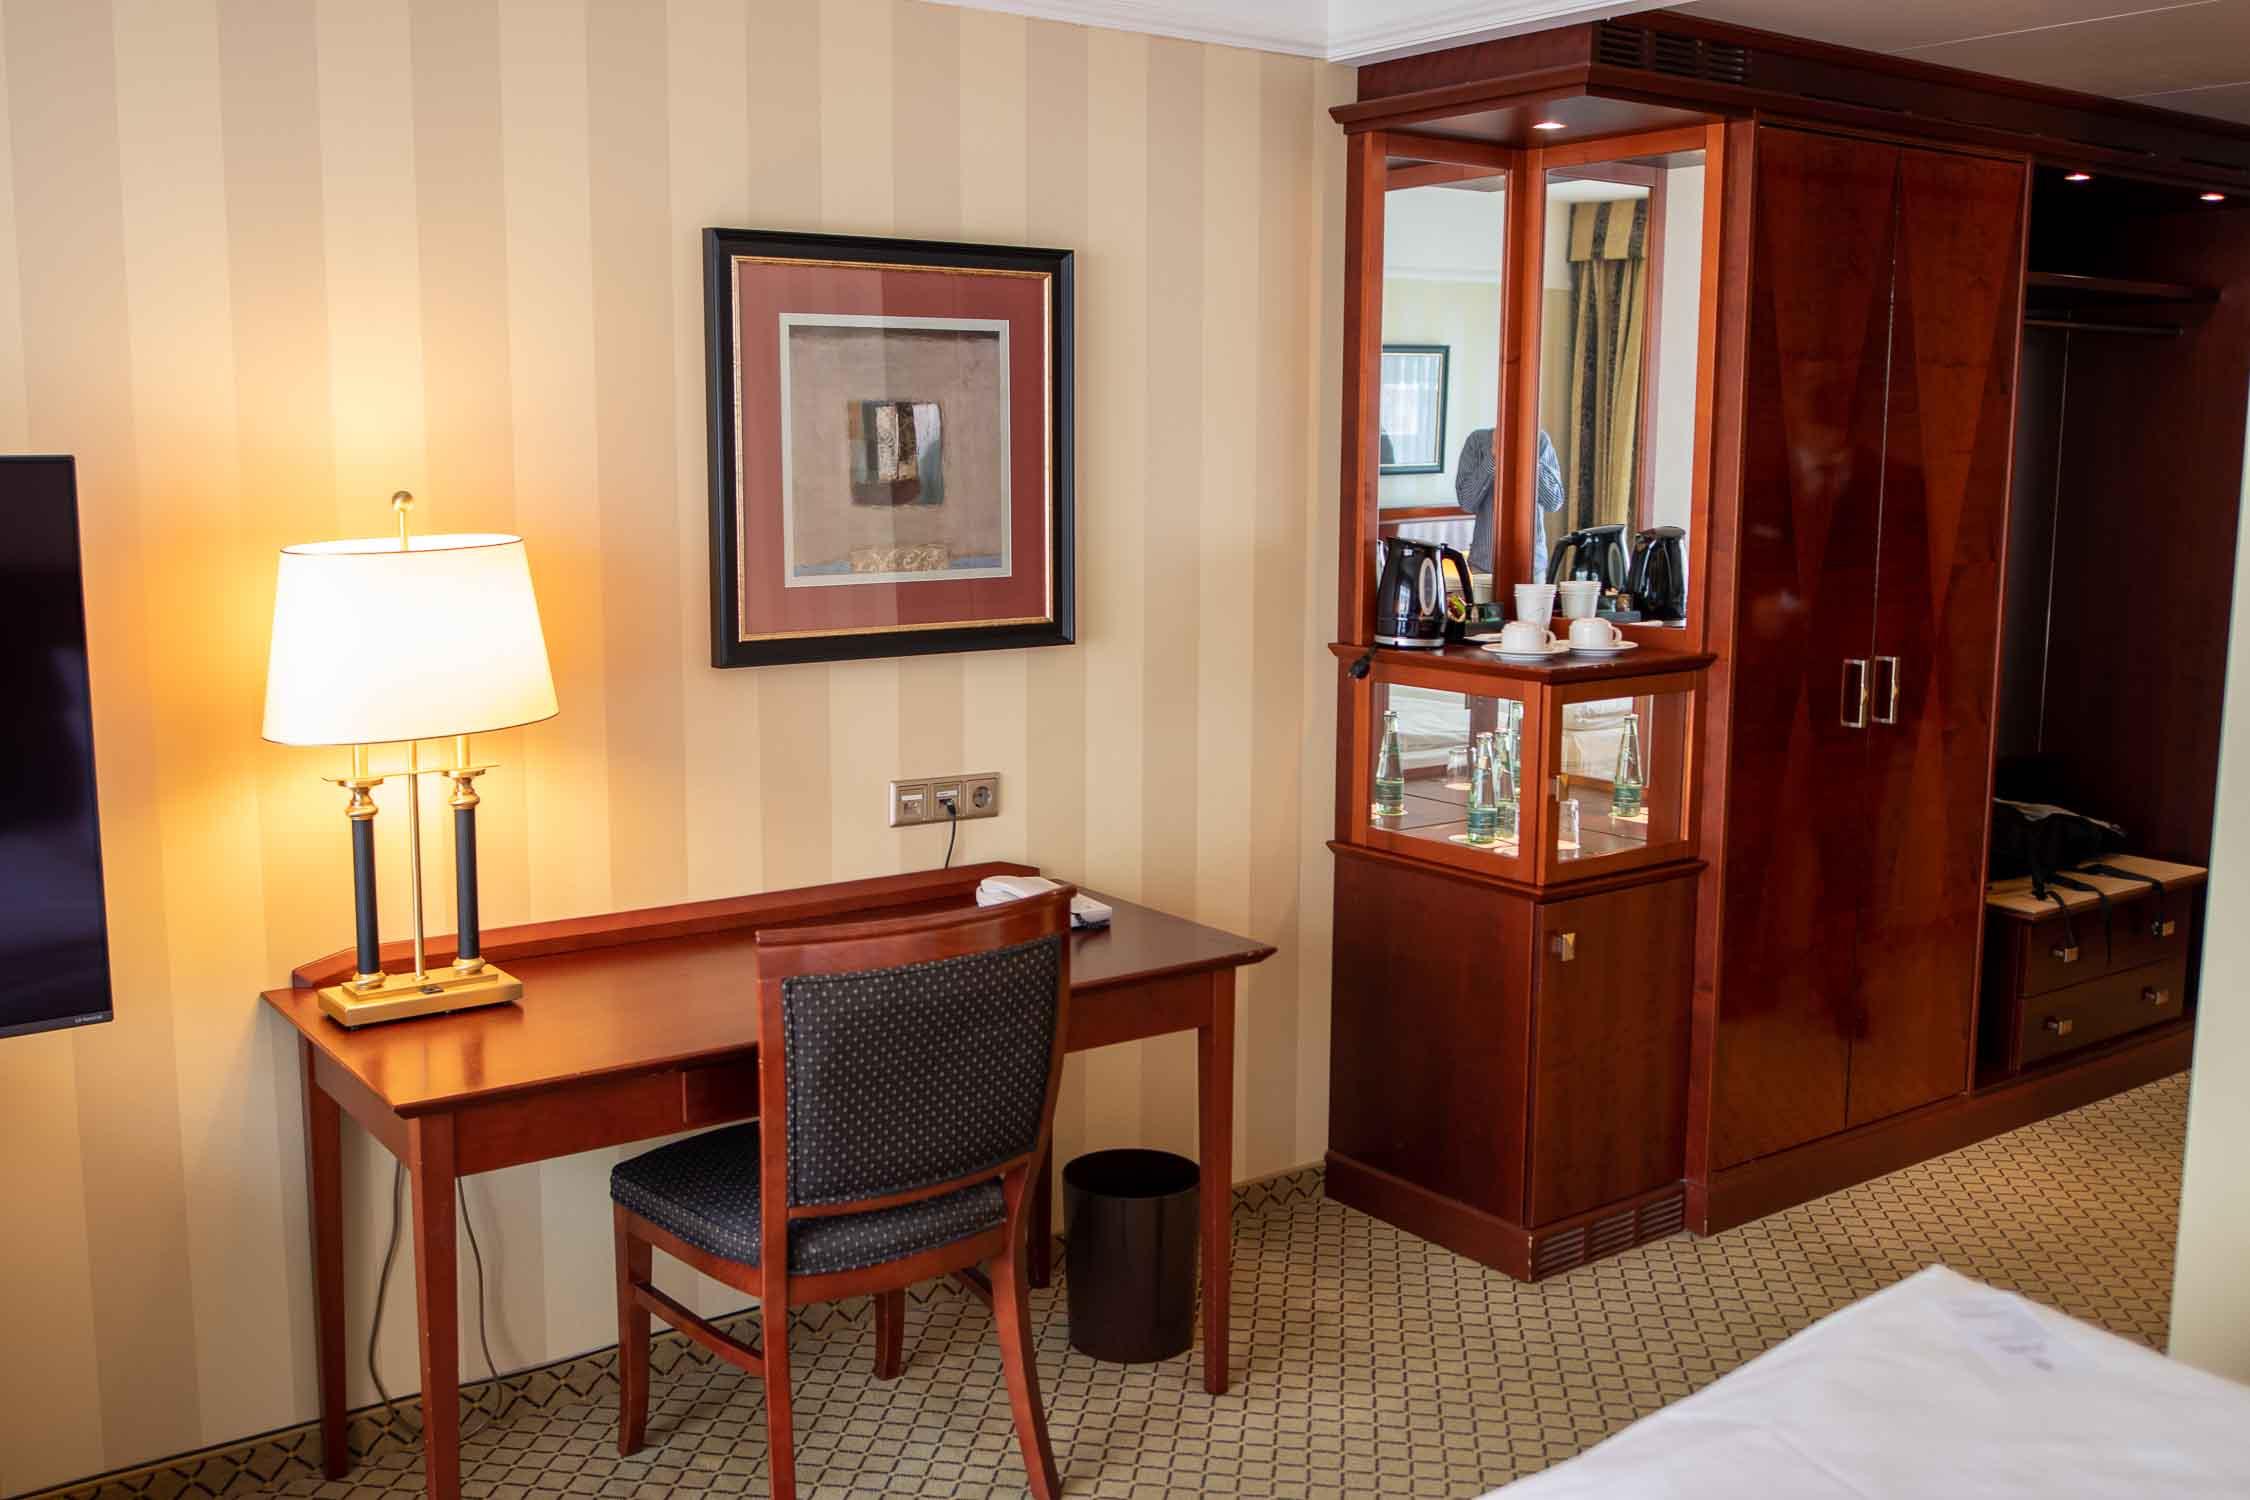 Zimmer JW Marriott Hotel Berlin Erfahrungsbericht-3